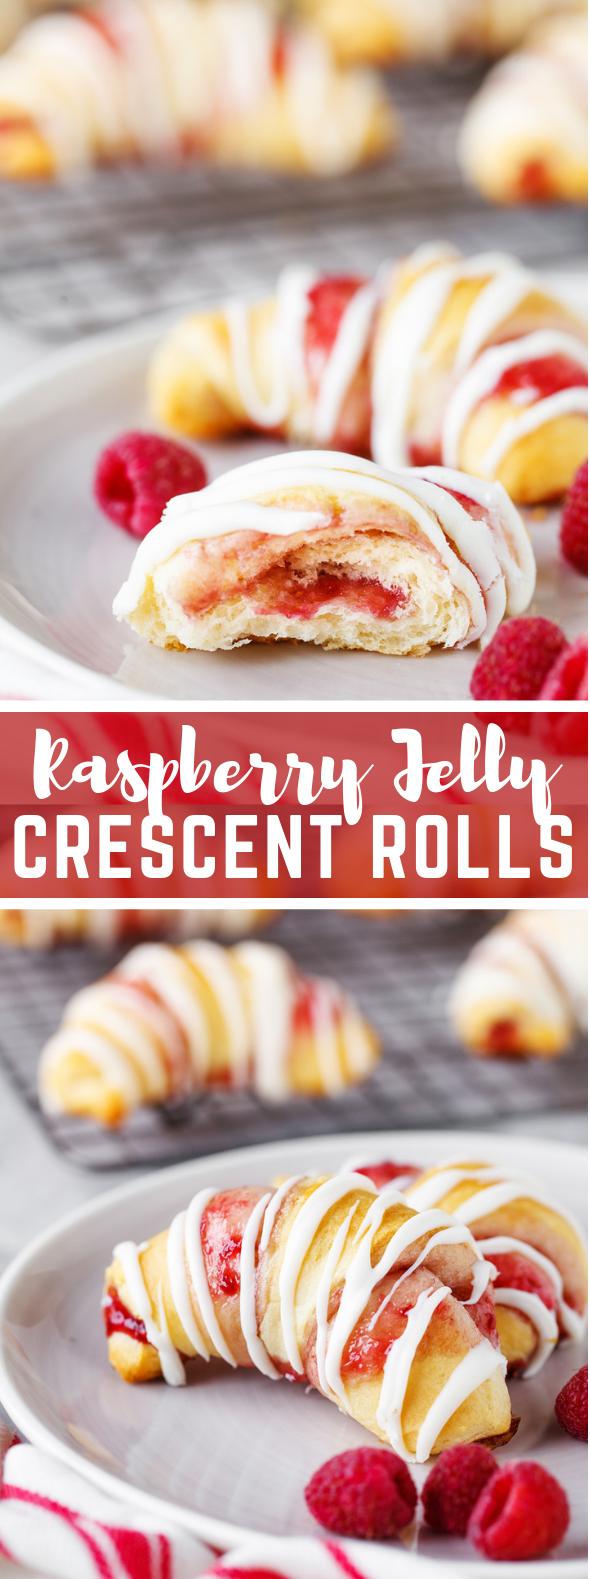 RASPBERRY CRESCENT ROLLS #dessert #sweets